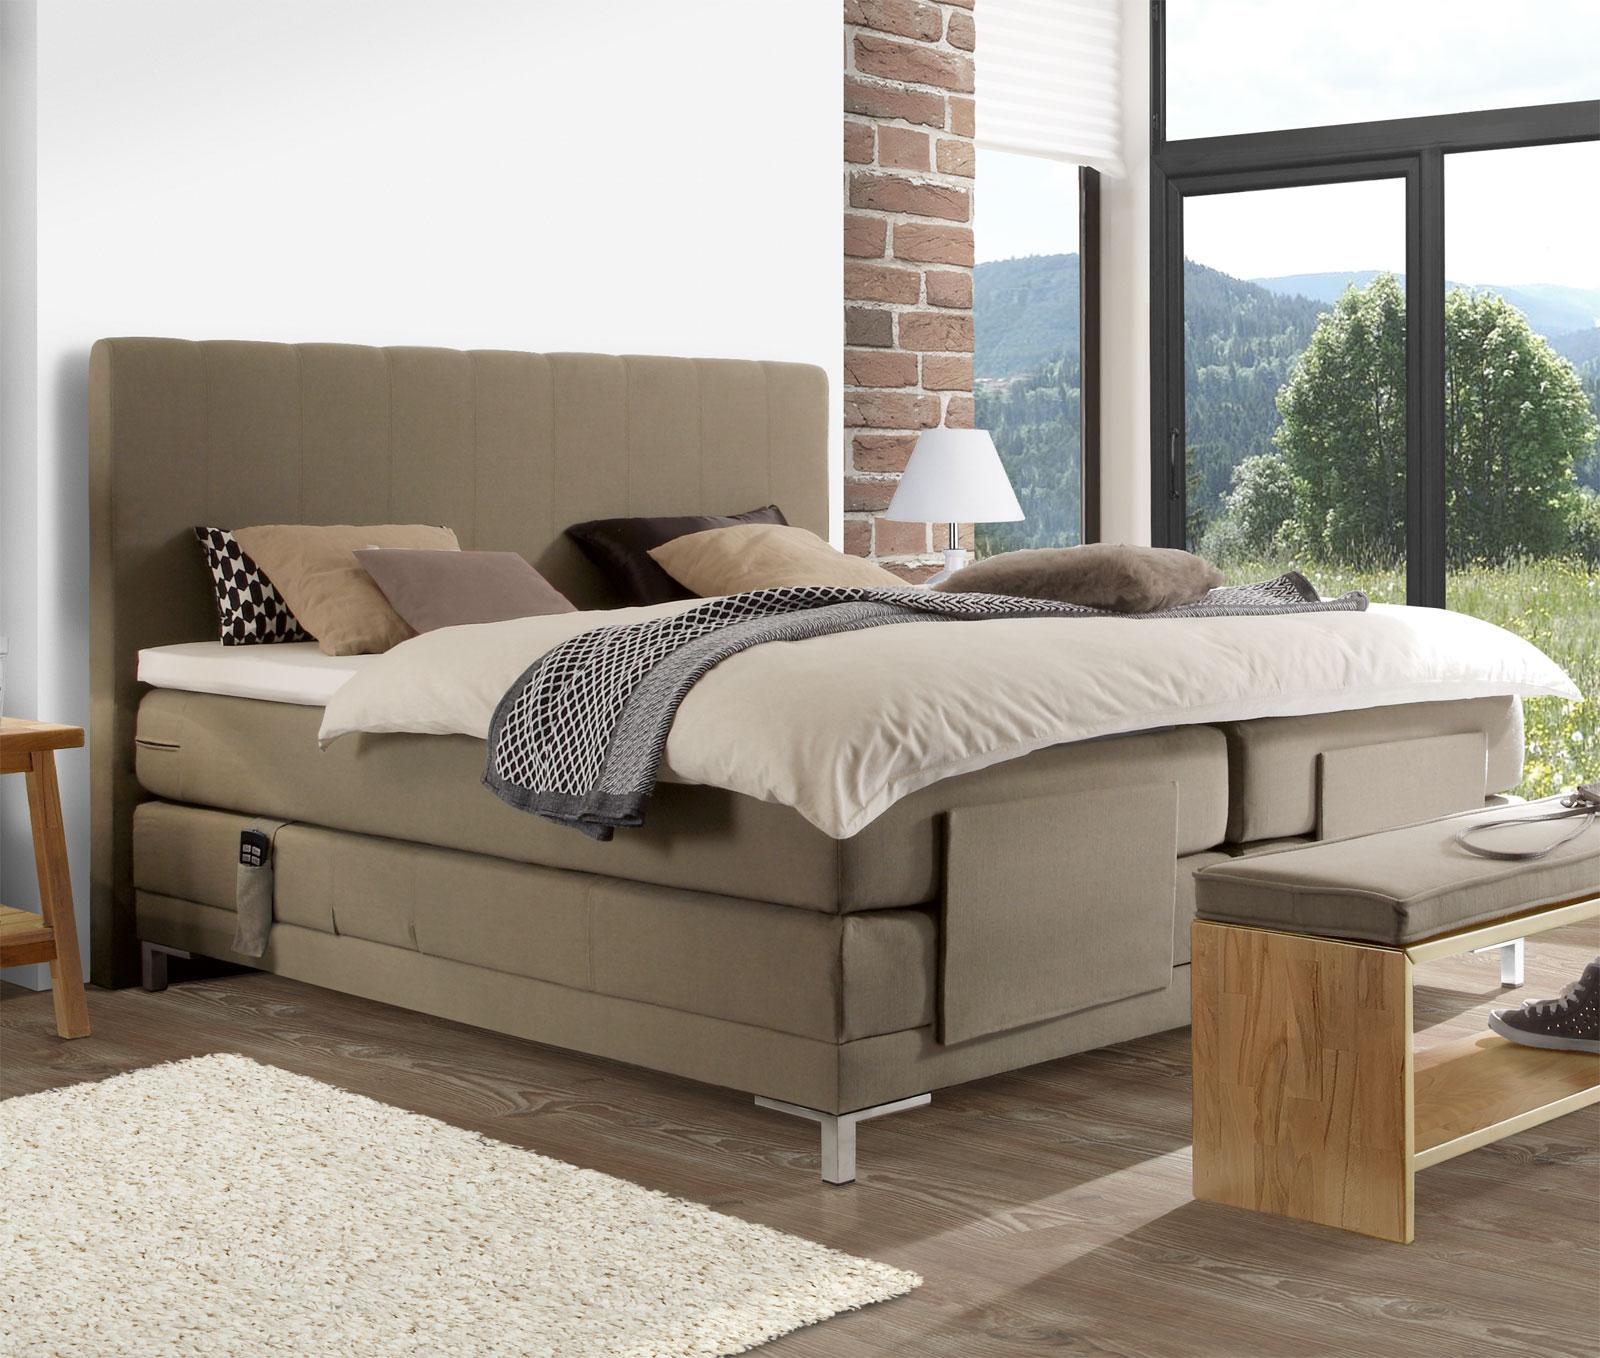 box spring bett boxspring bett online kaufen otto. Black Bedroom Furniture Sets. Home Design Ideas